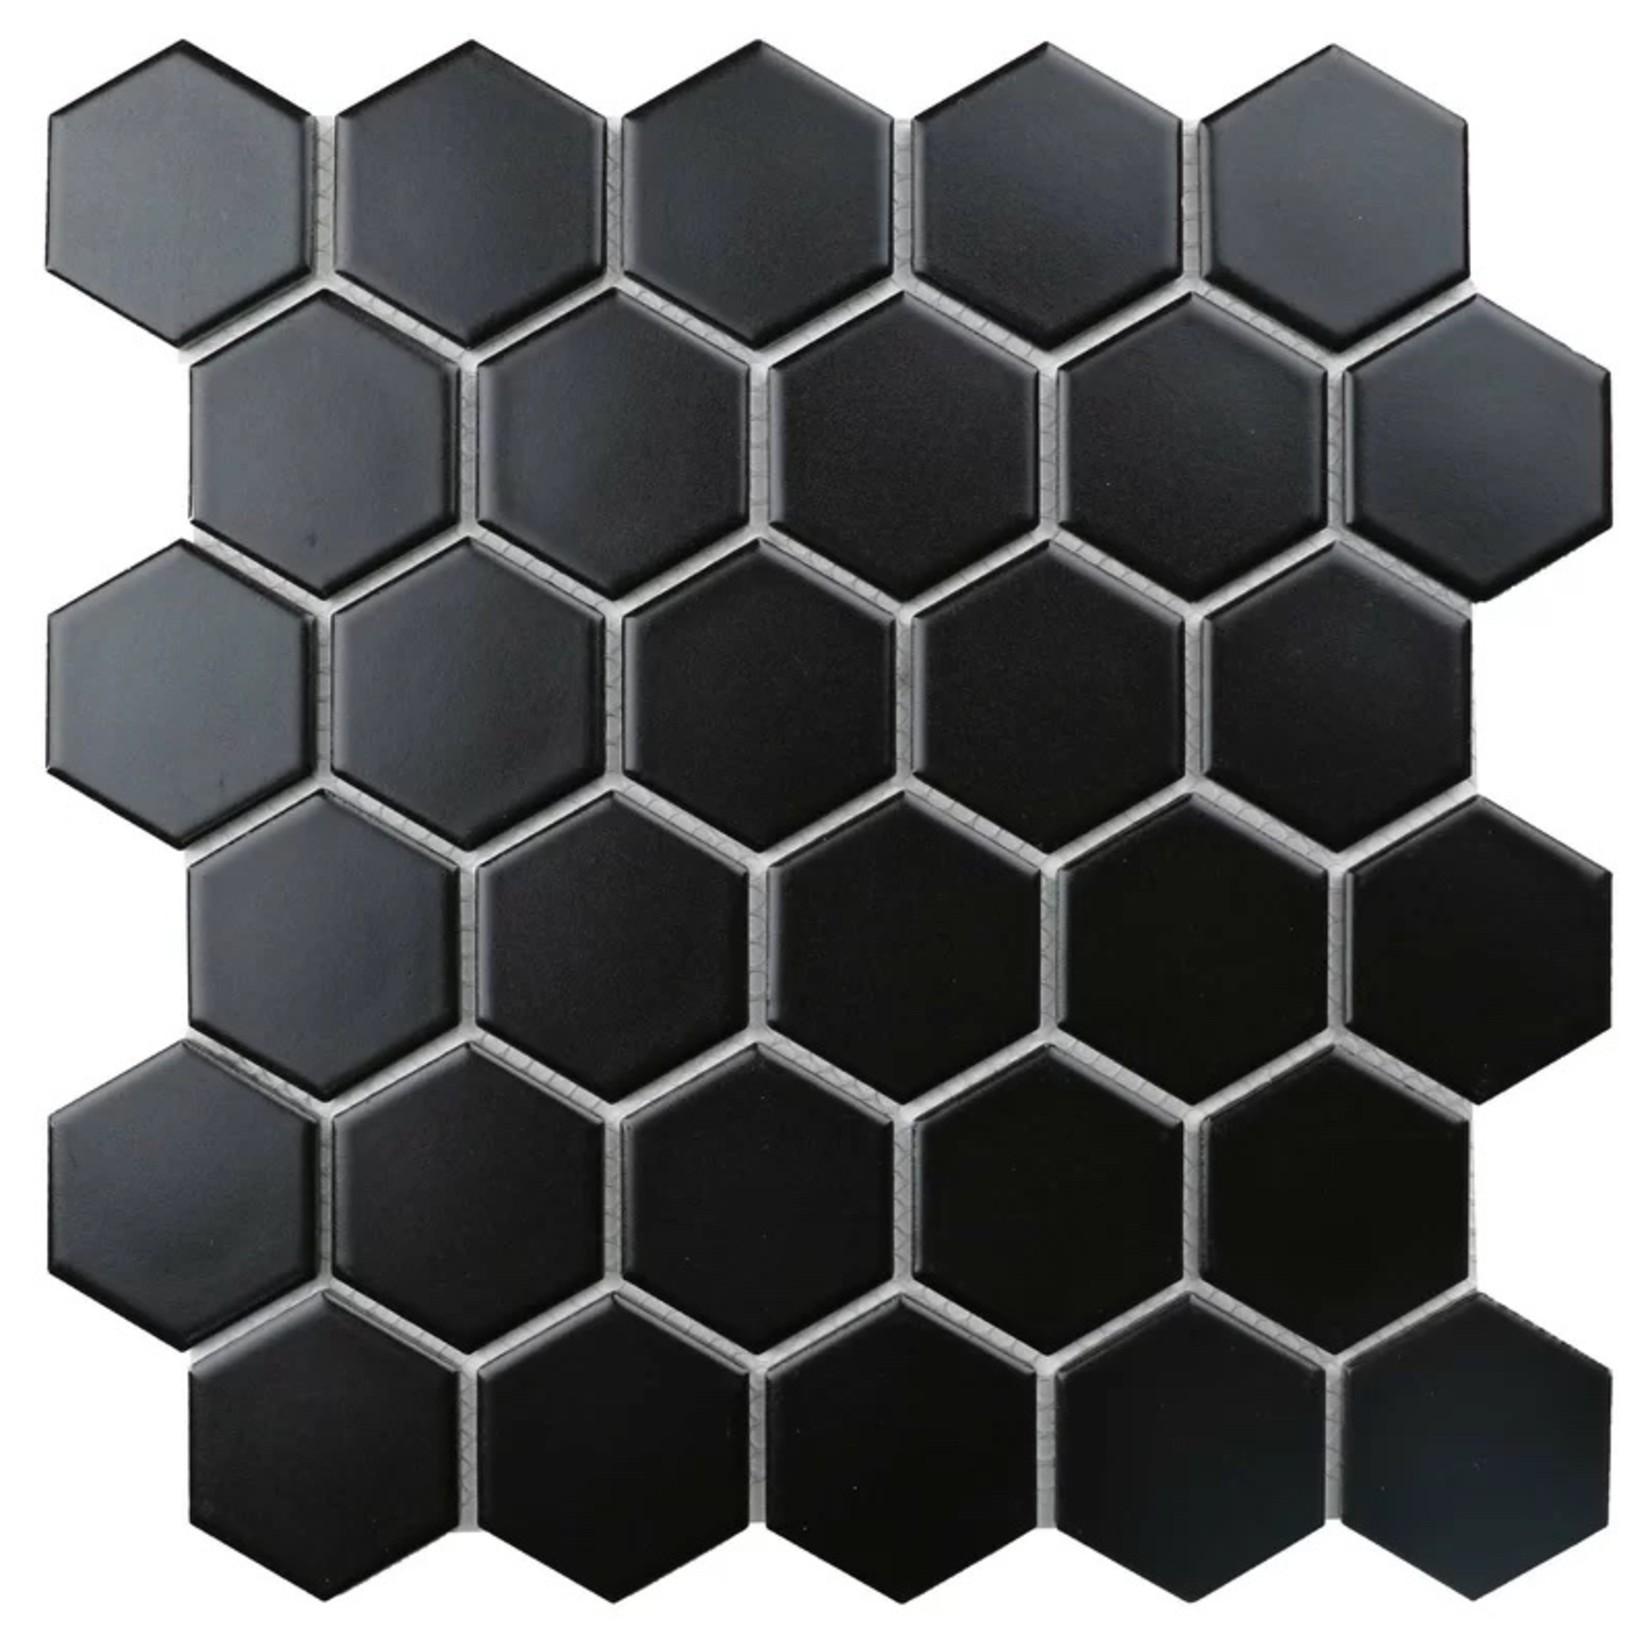 "*Value Series 2"" x 2"" Porcelain Honeycomb Mosaic Tile - Black - 2 tiles with defects"